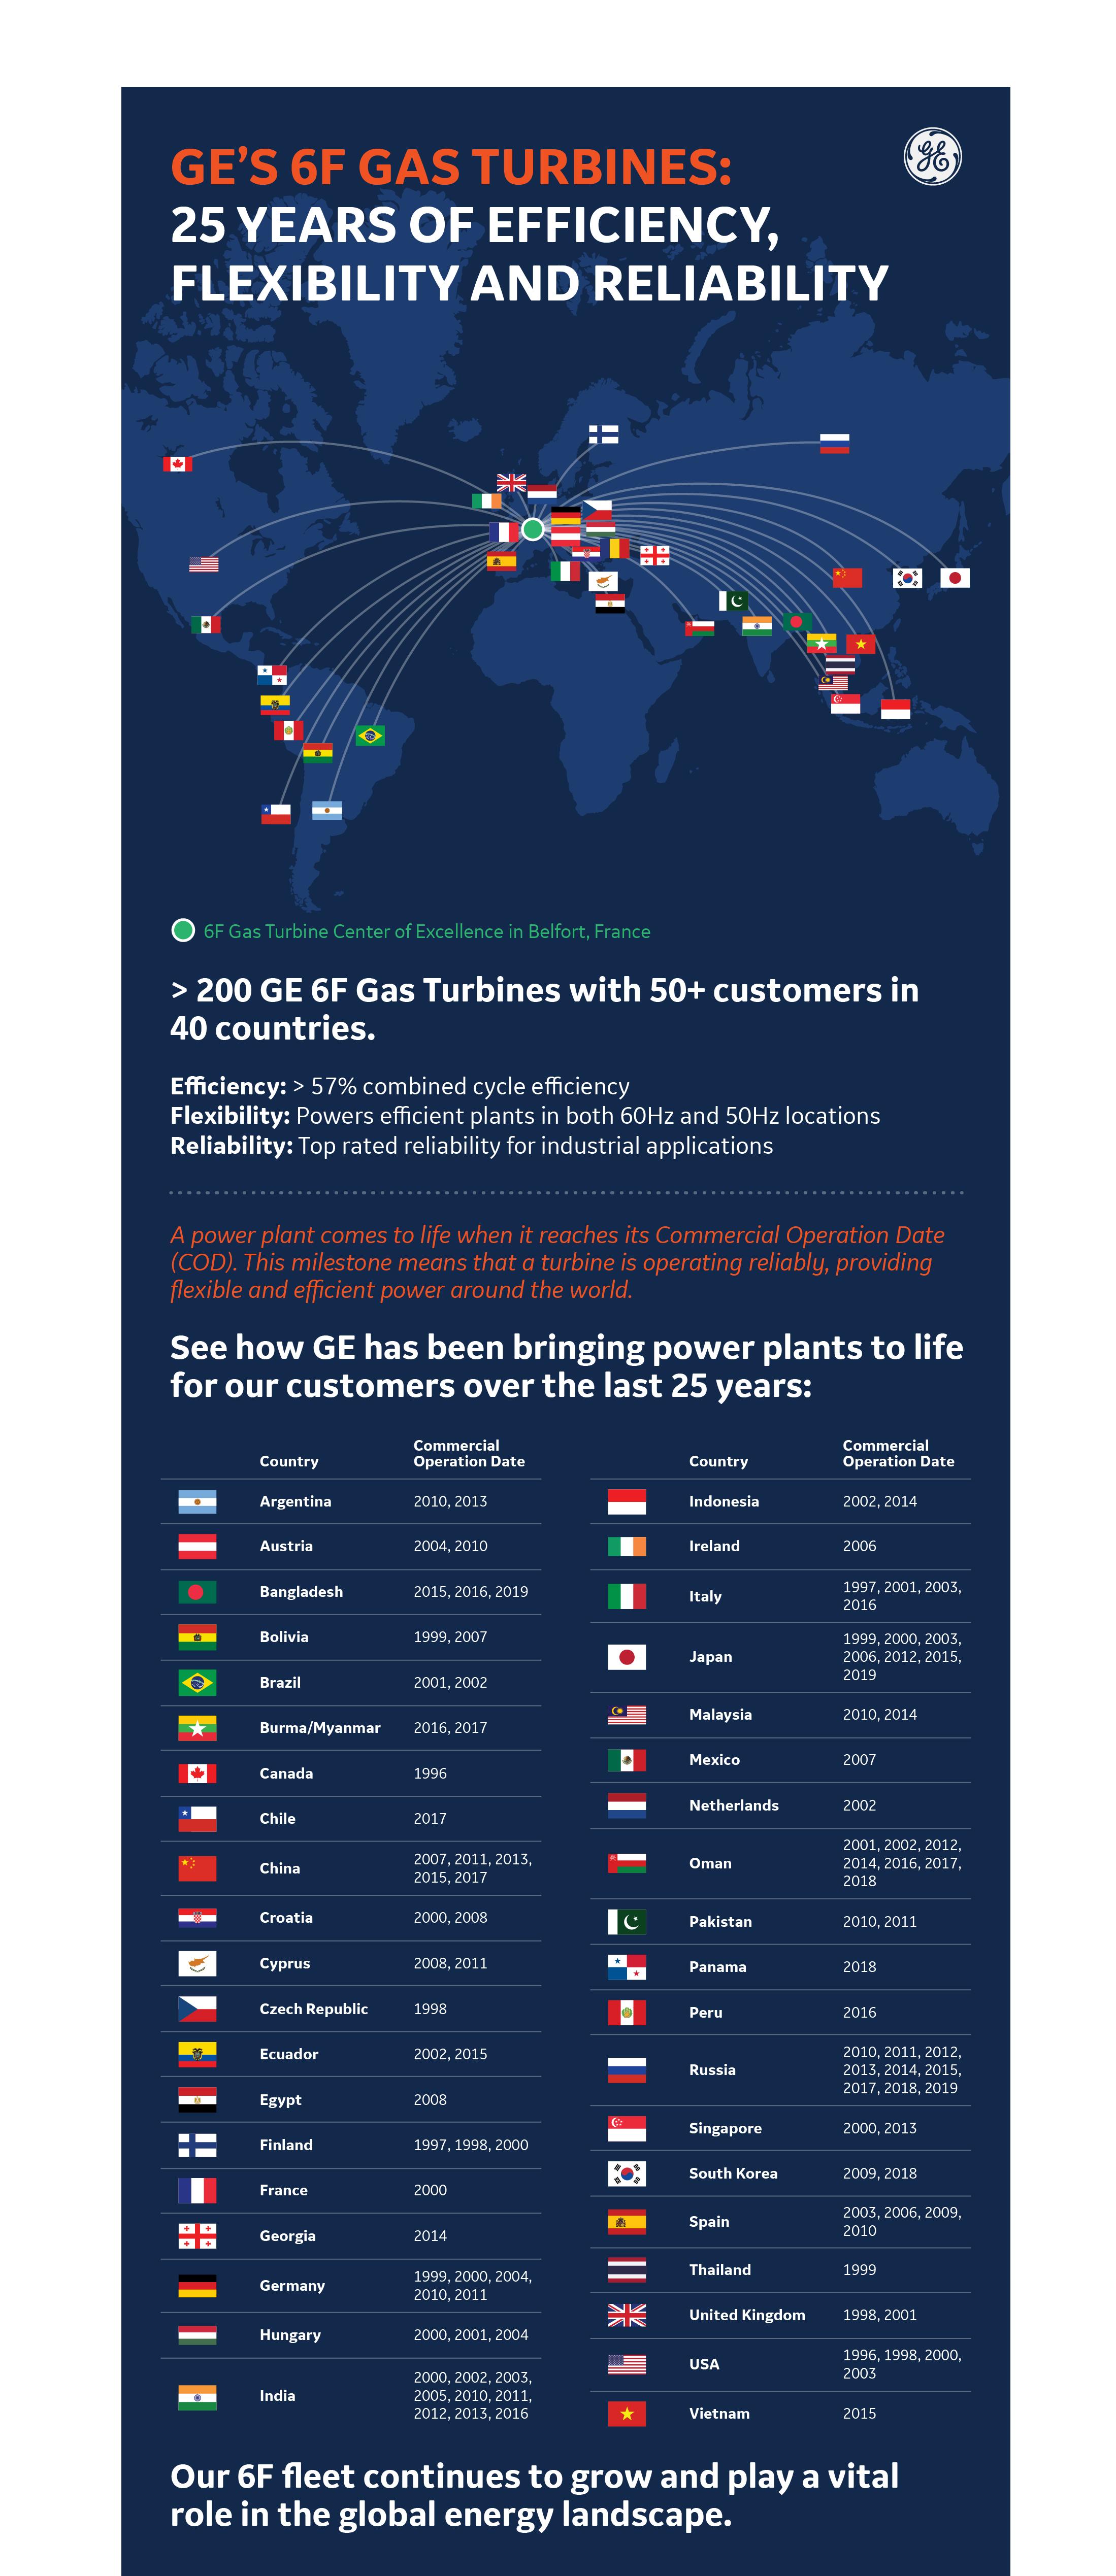 GE Celebrates 25th Anniversary of Its 6F Gas Turbine